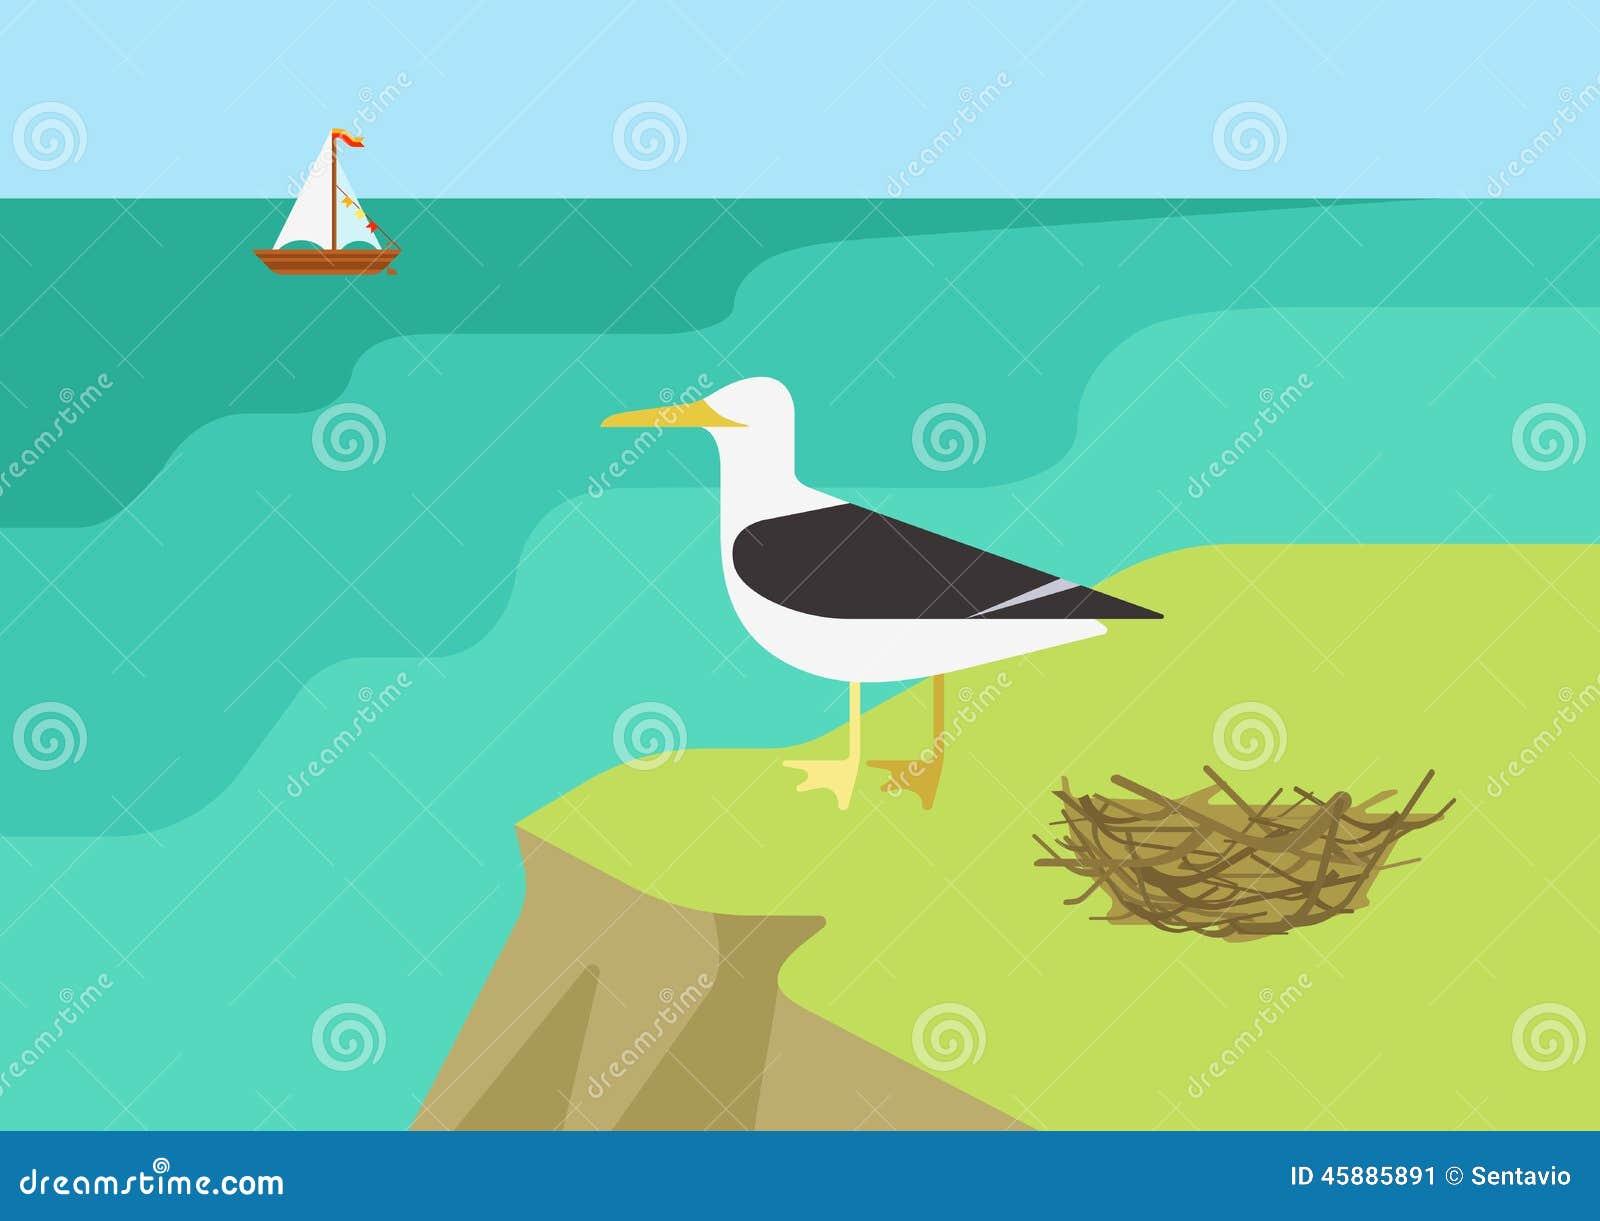 Seagull Gull Nest Beach Flat Cartoon Vector Wild Animals Birds Stock ...